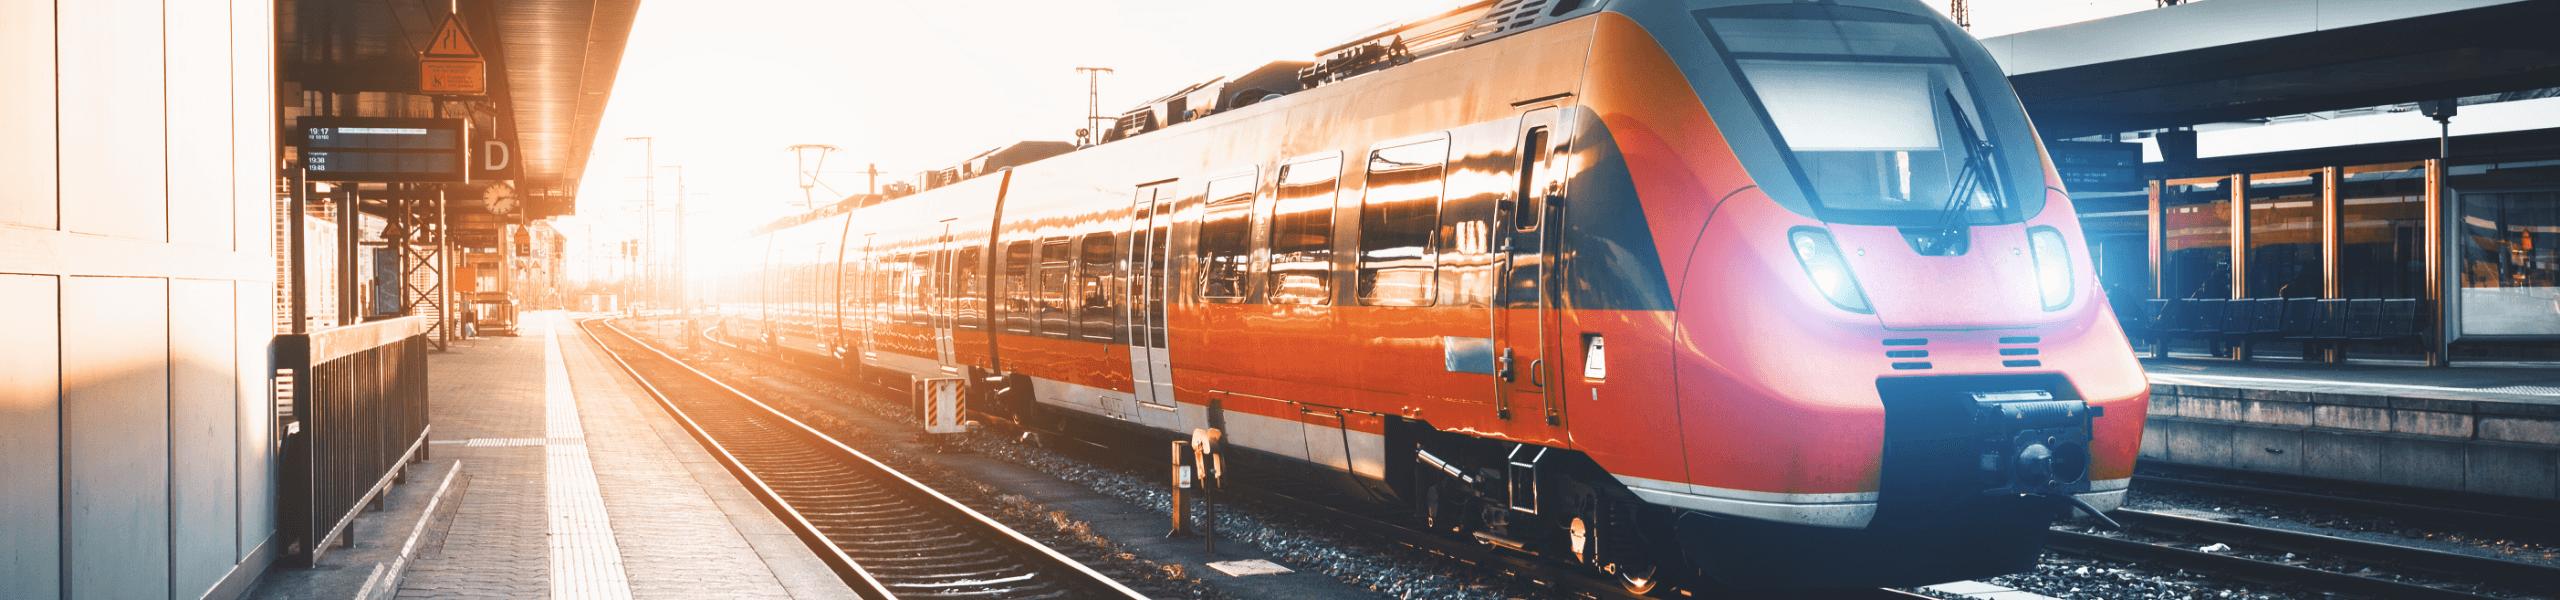 Ferroviario herramientas